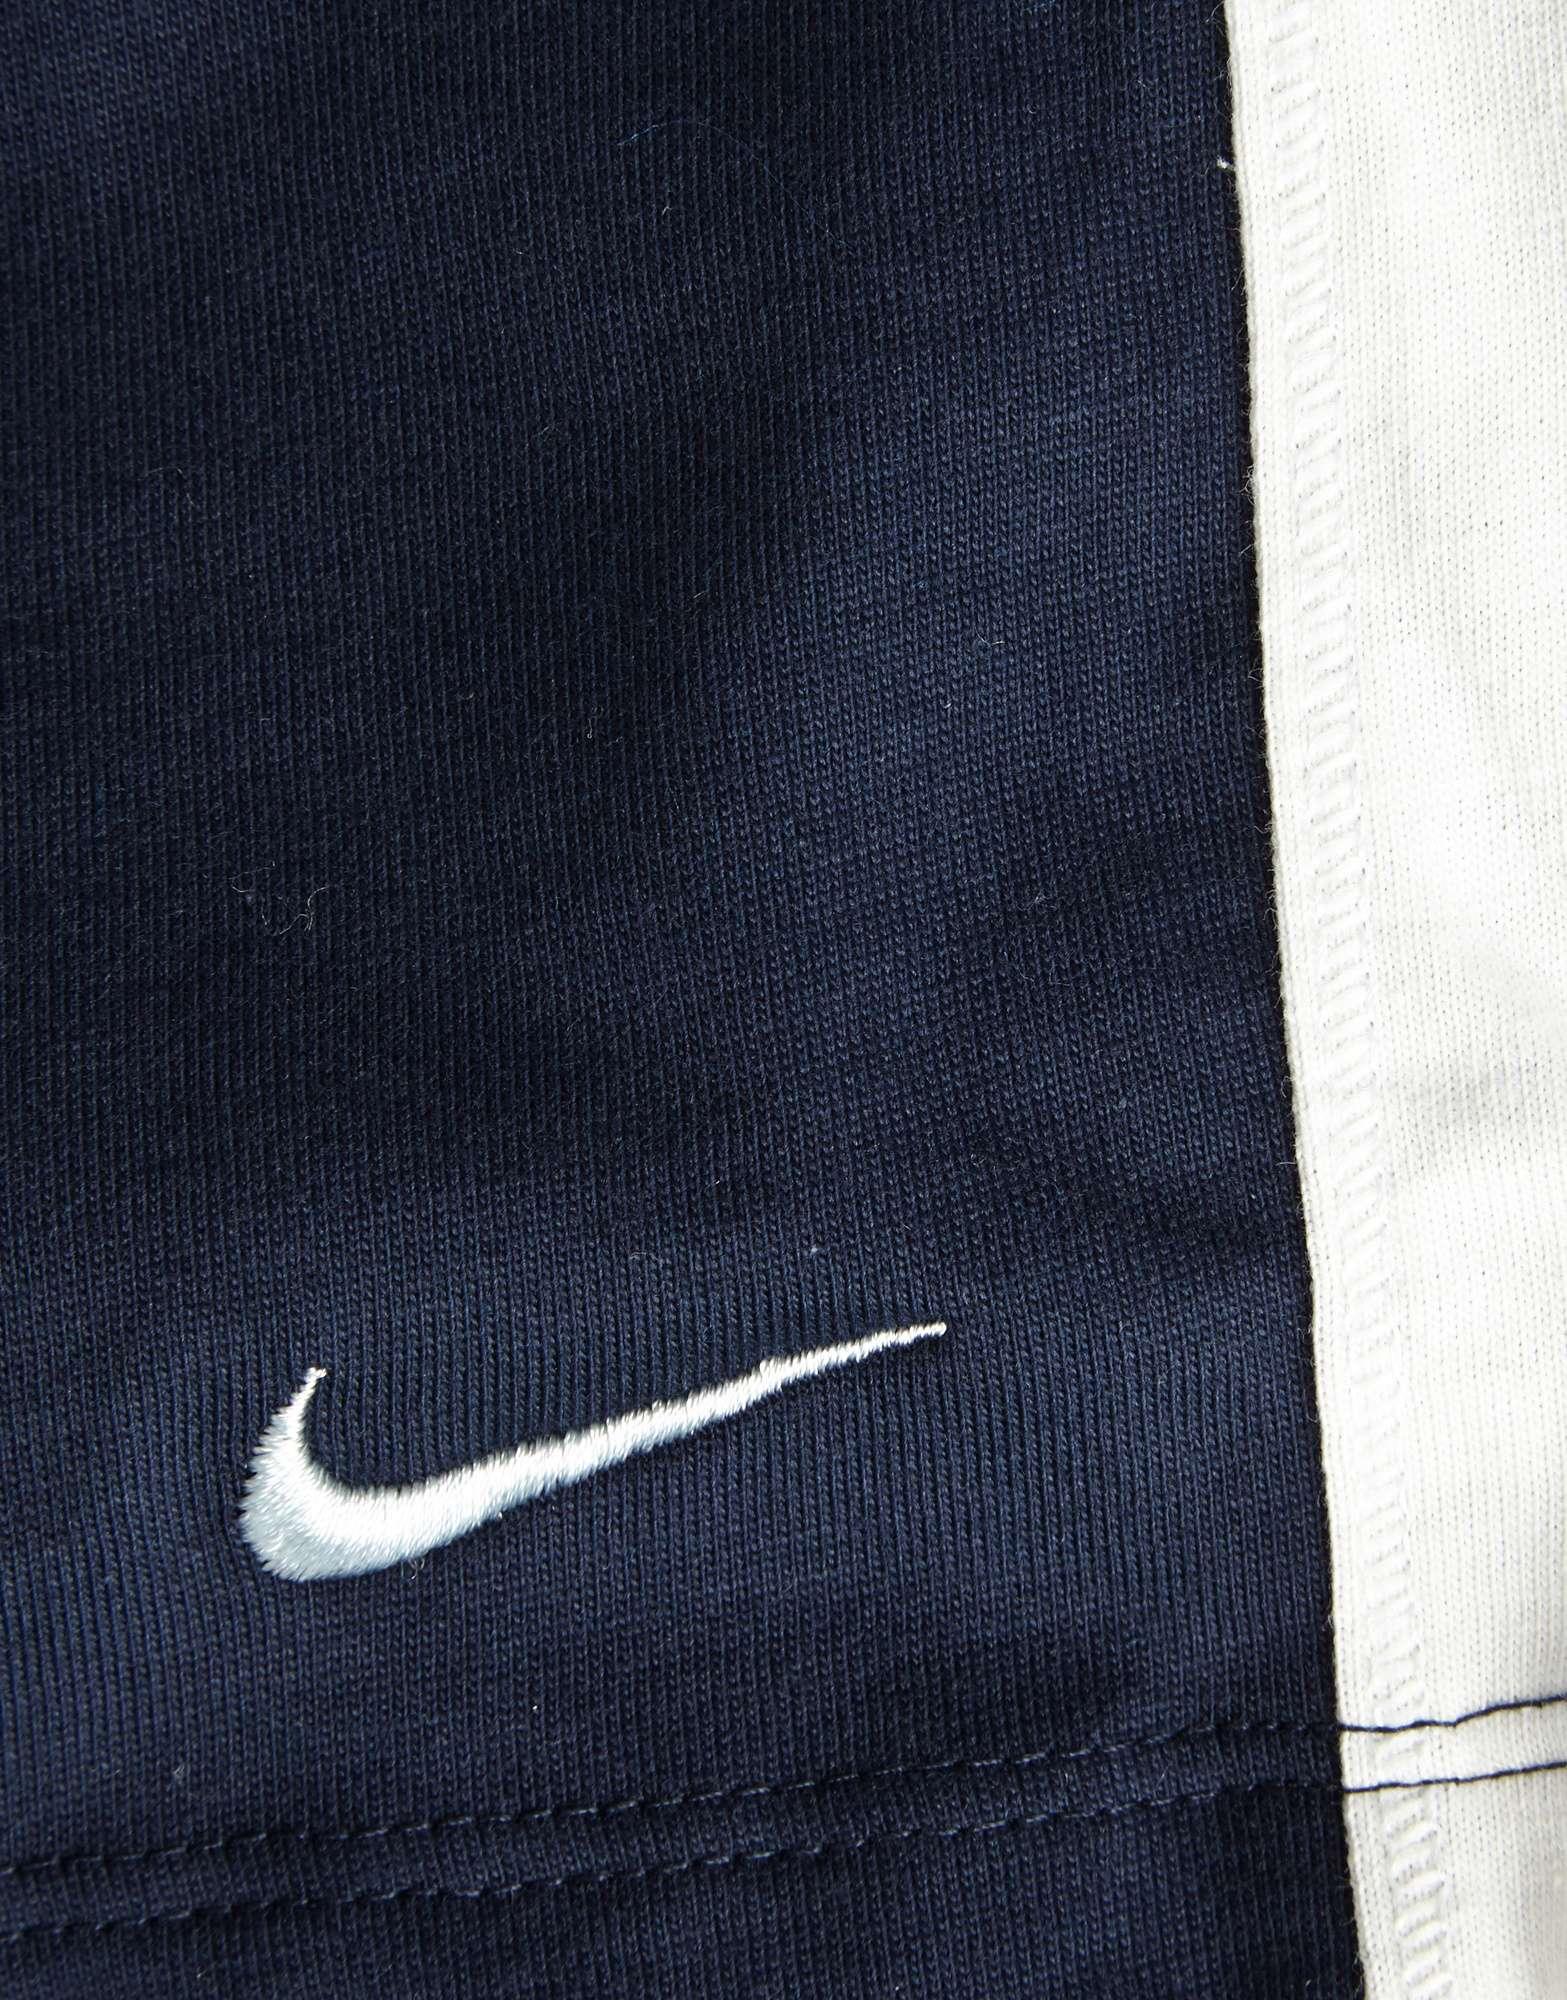 Nike Just Do It T-Shirt Shorts Set Infants